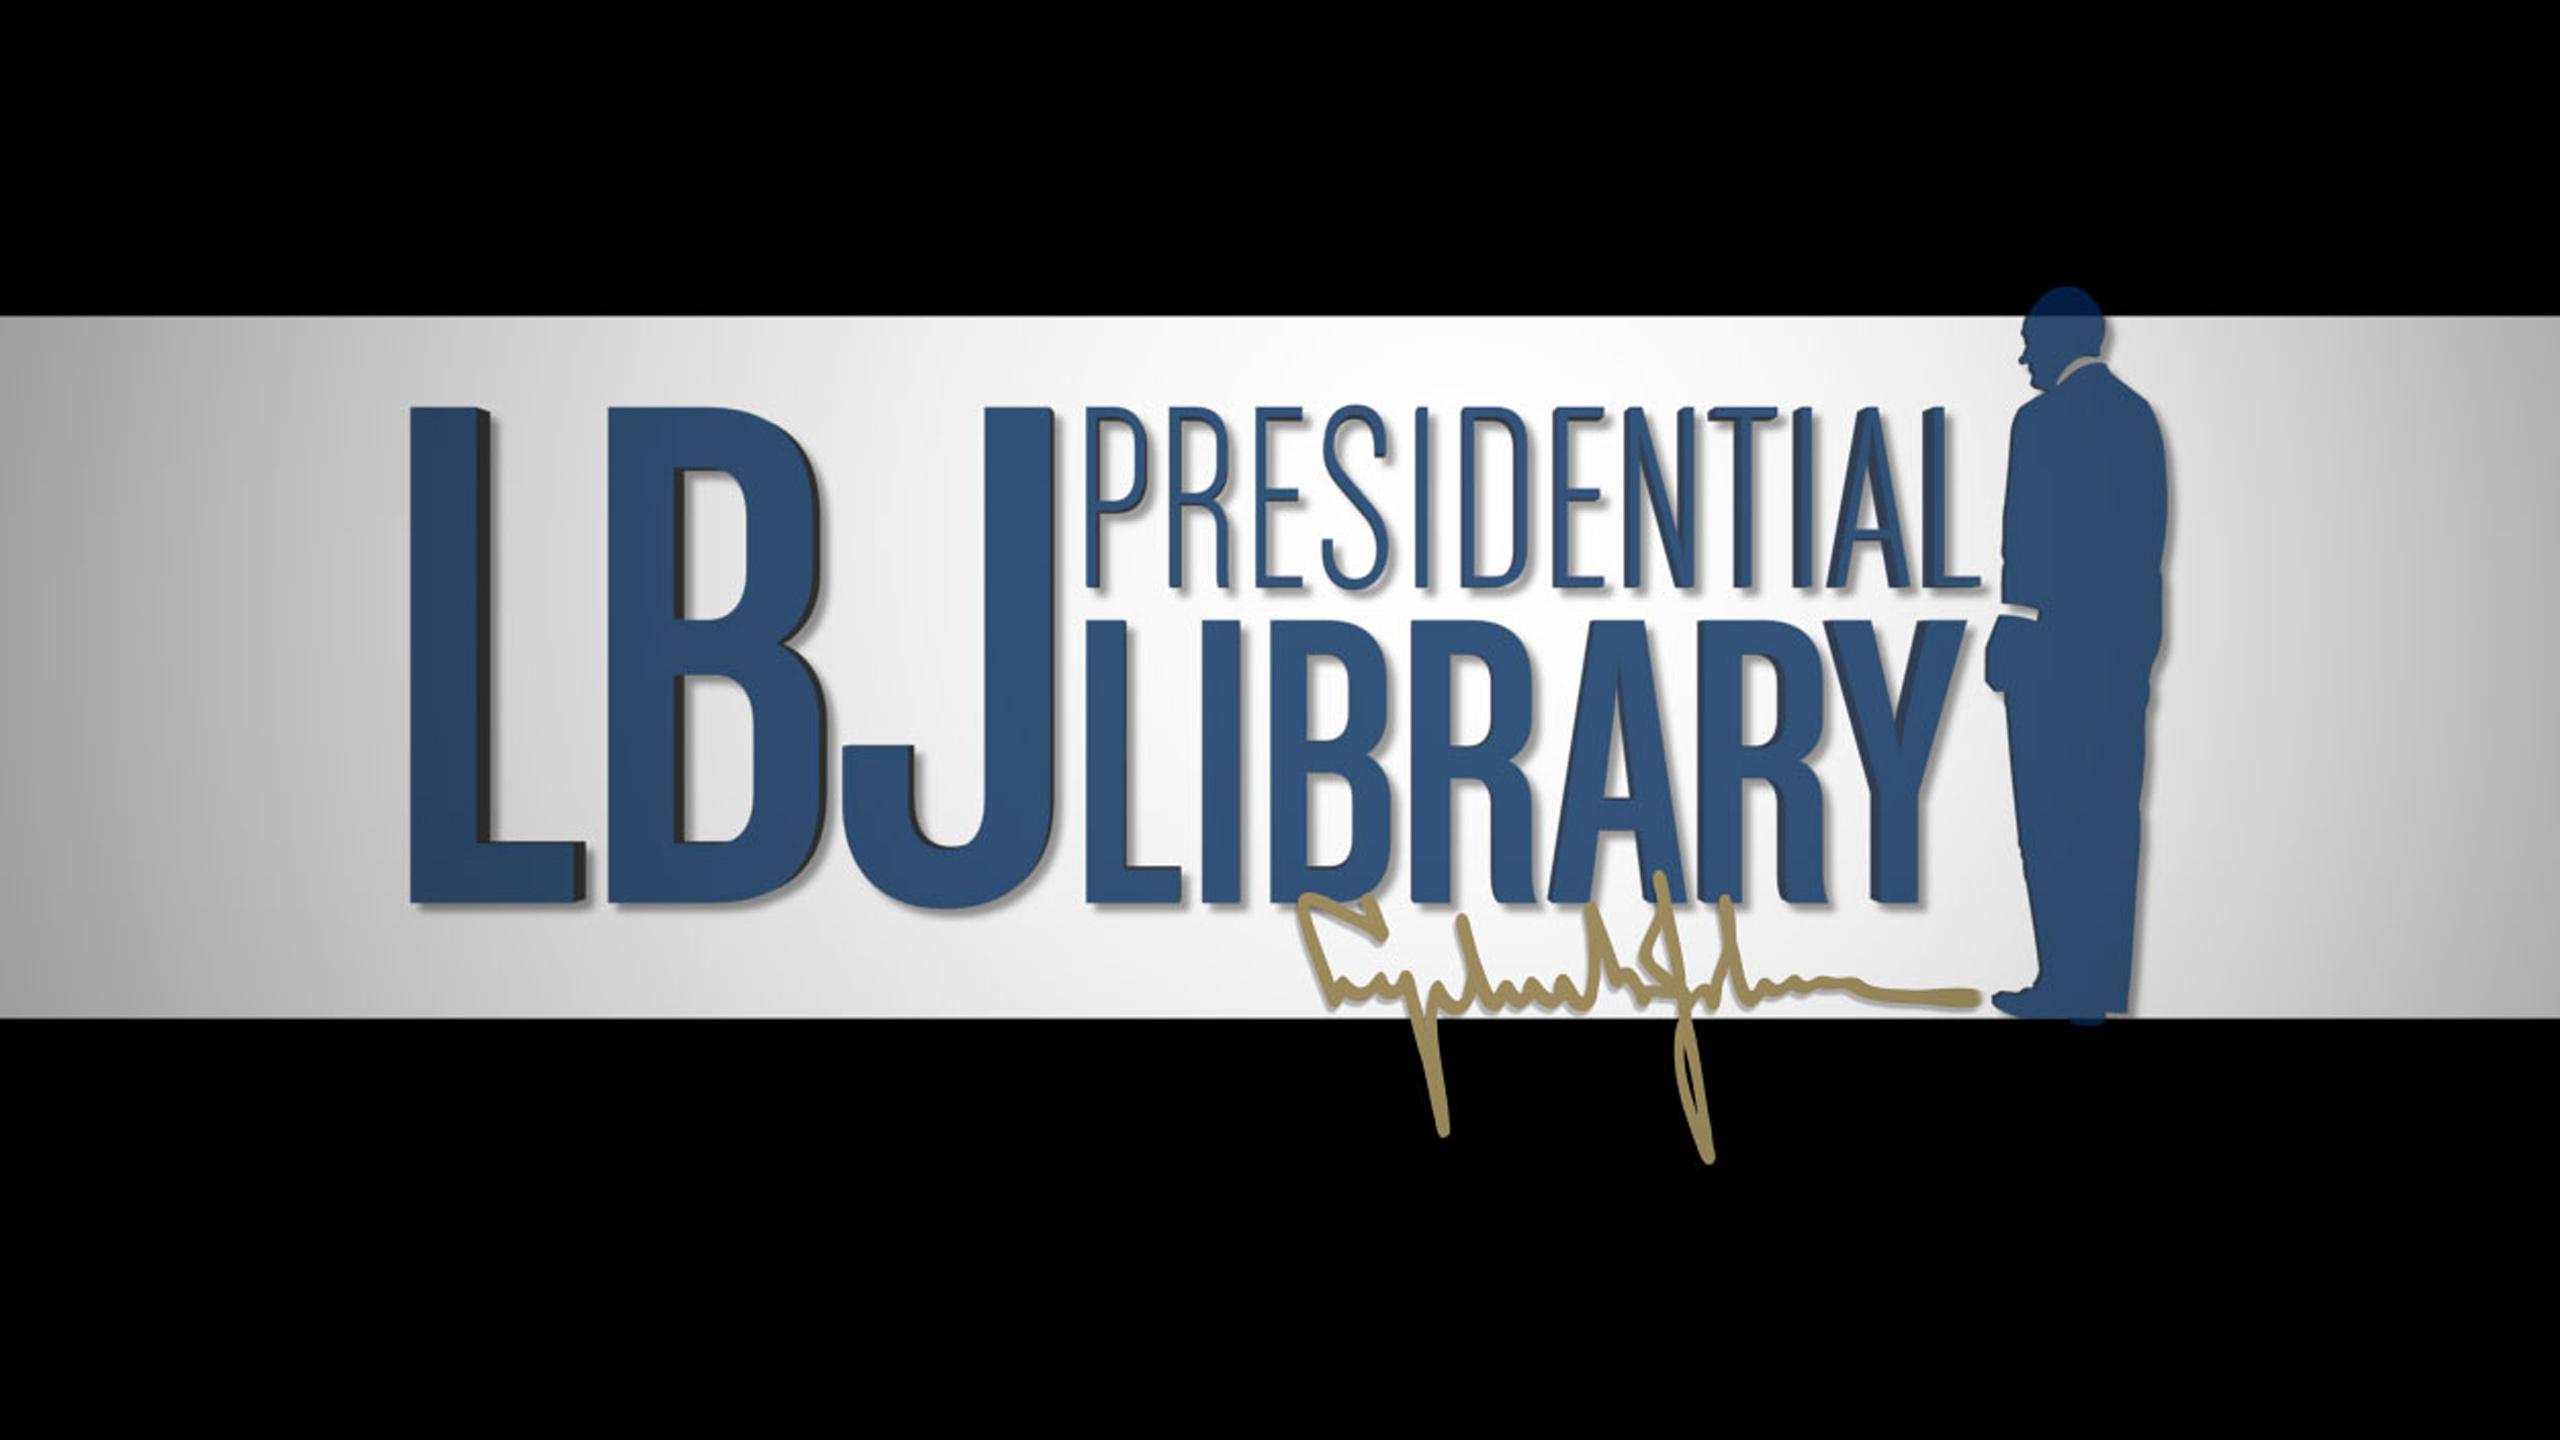 LBJ Presents: Joe Biden